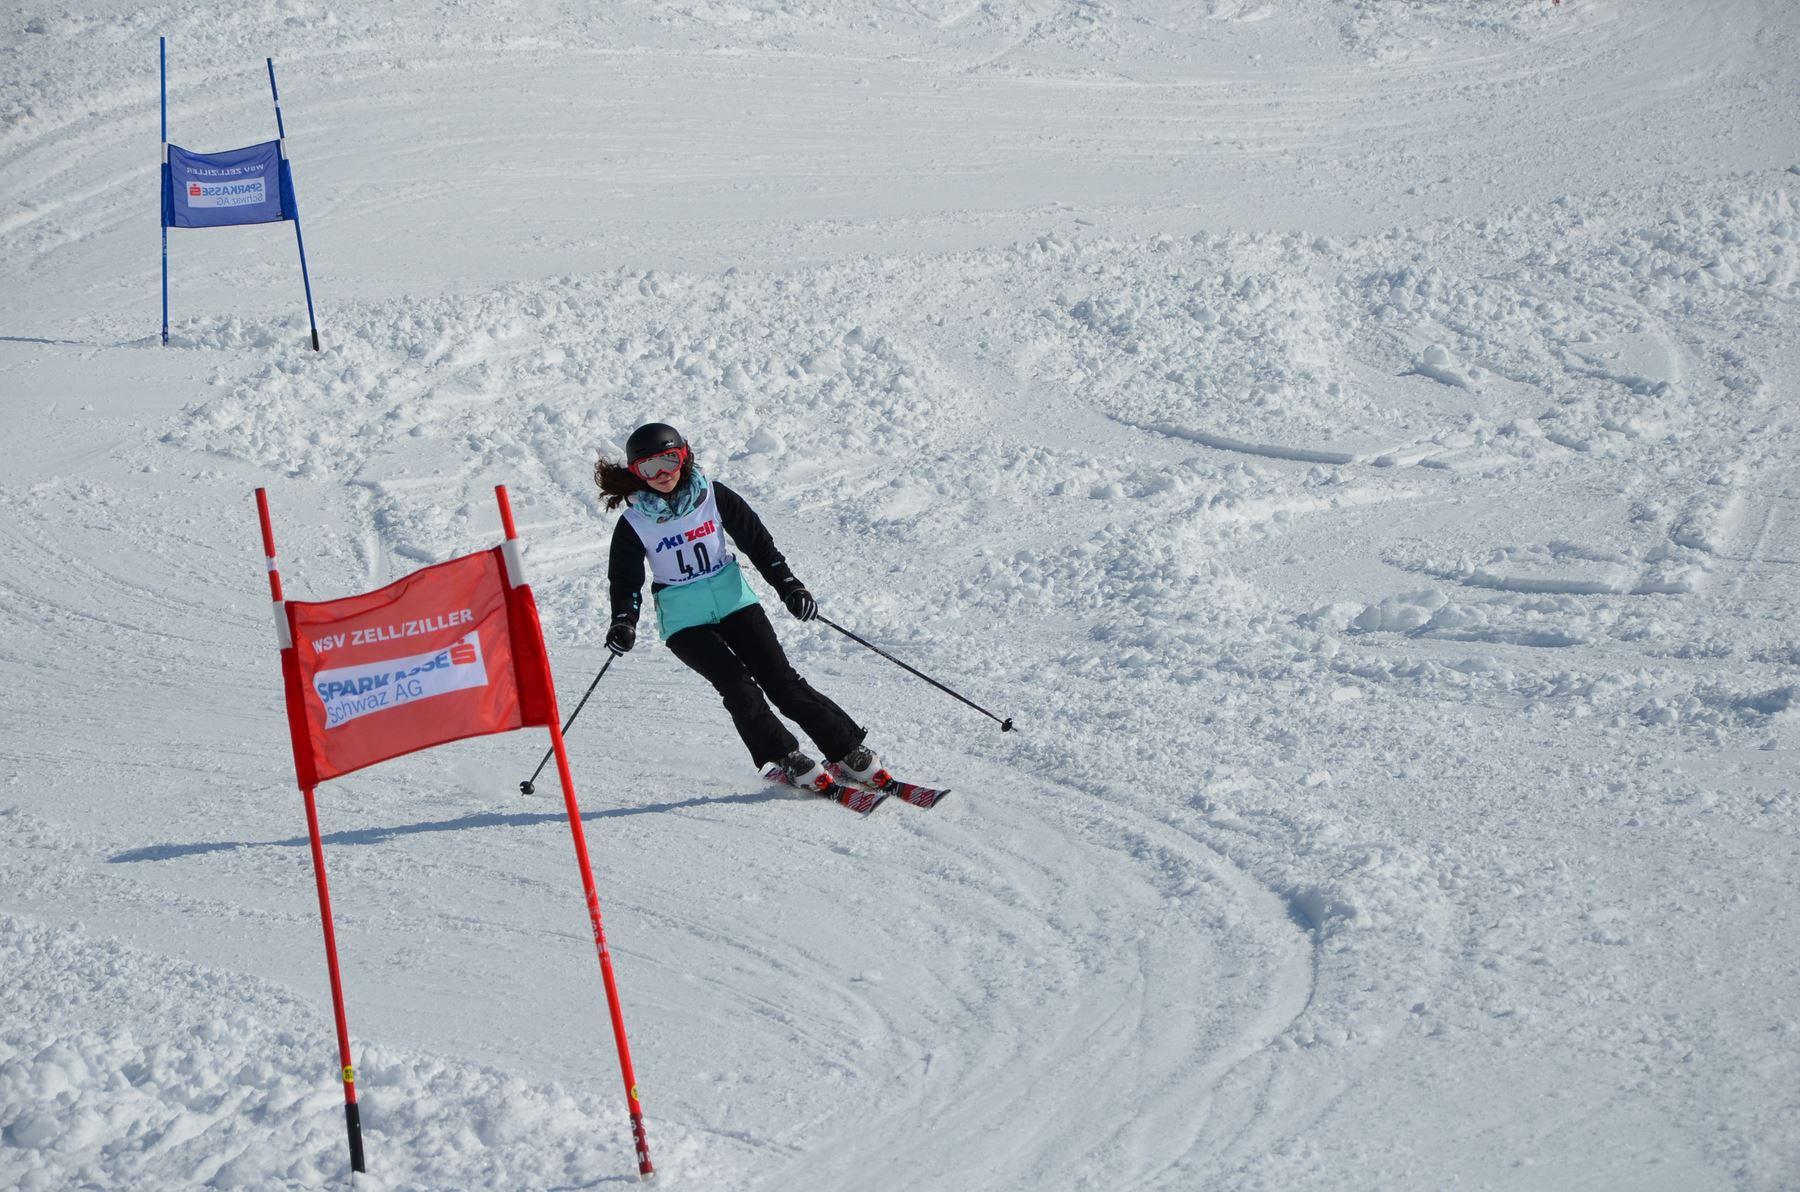 2015-03-22 BV Zillertal Skirennen 149.JPG